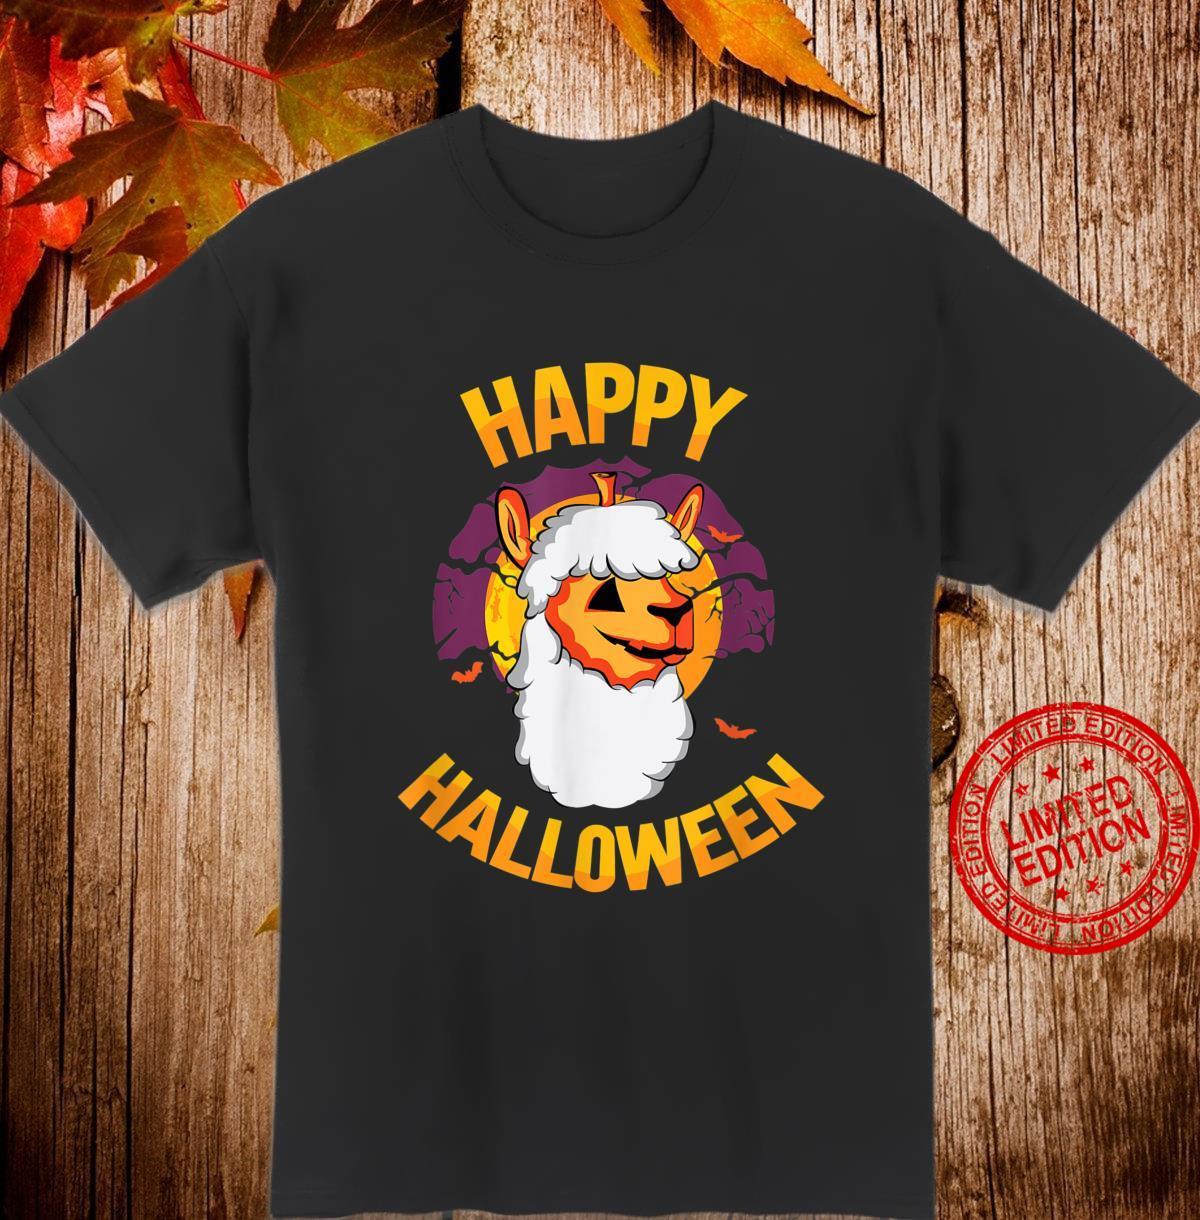 Happy Halloween Kürbis Alpaka Kostüm Halloween 2020 Shirt